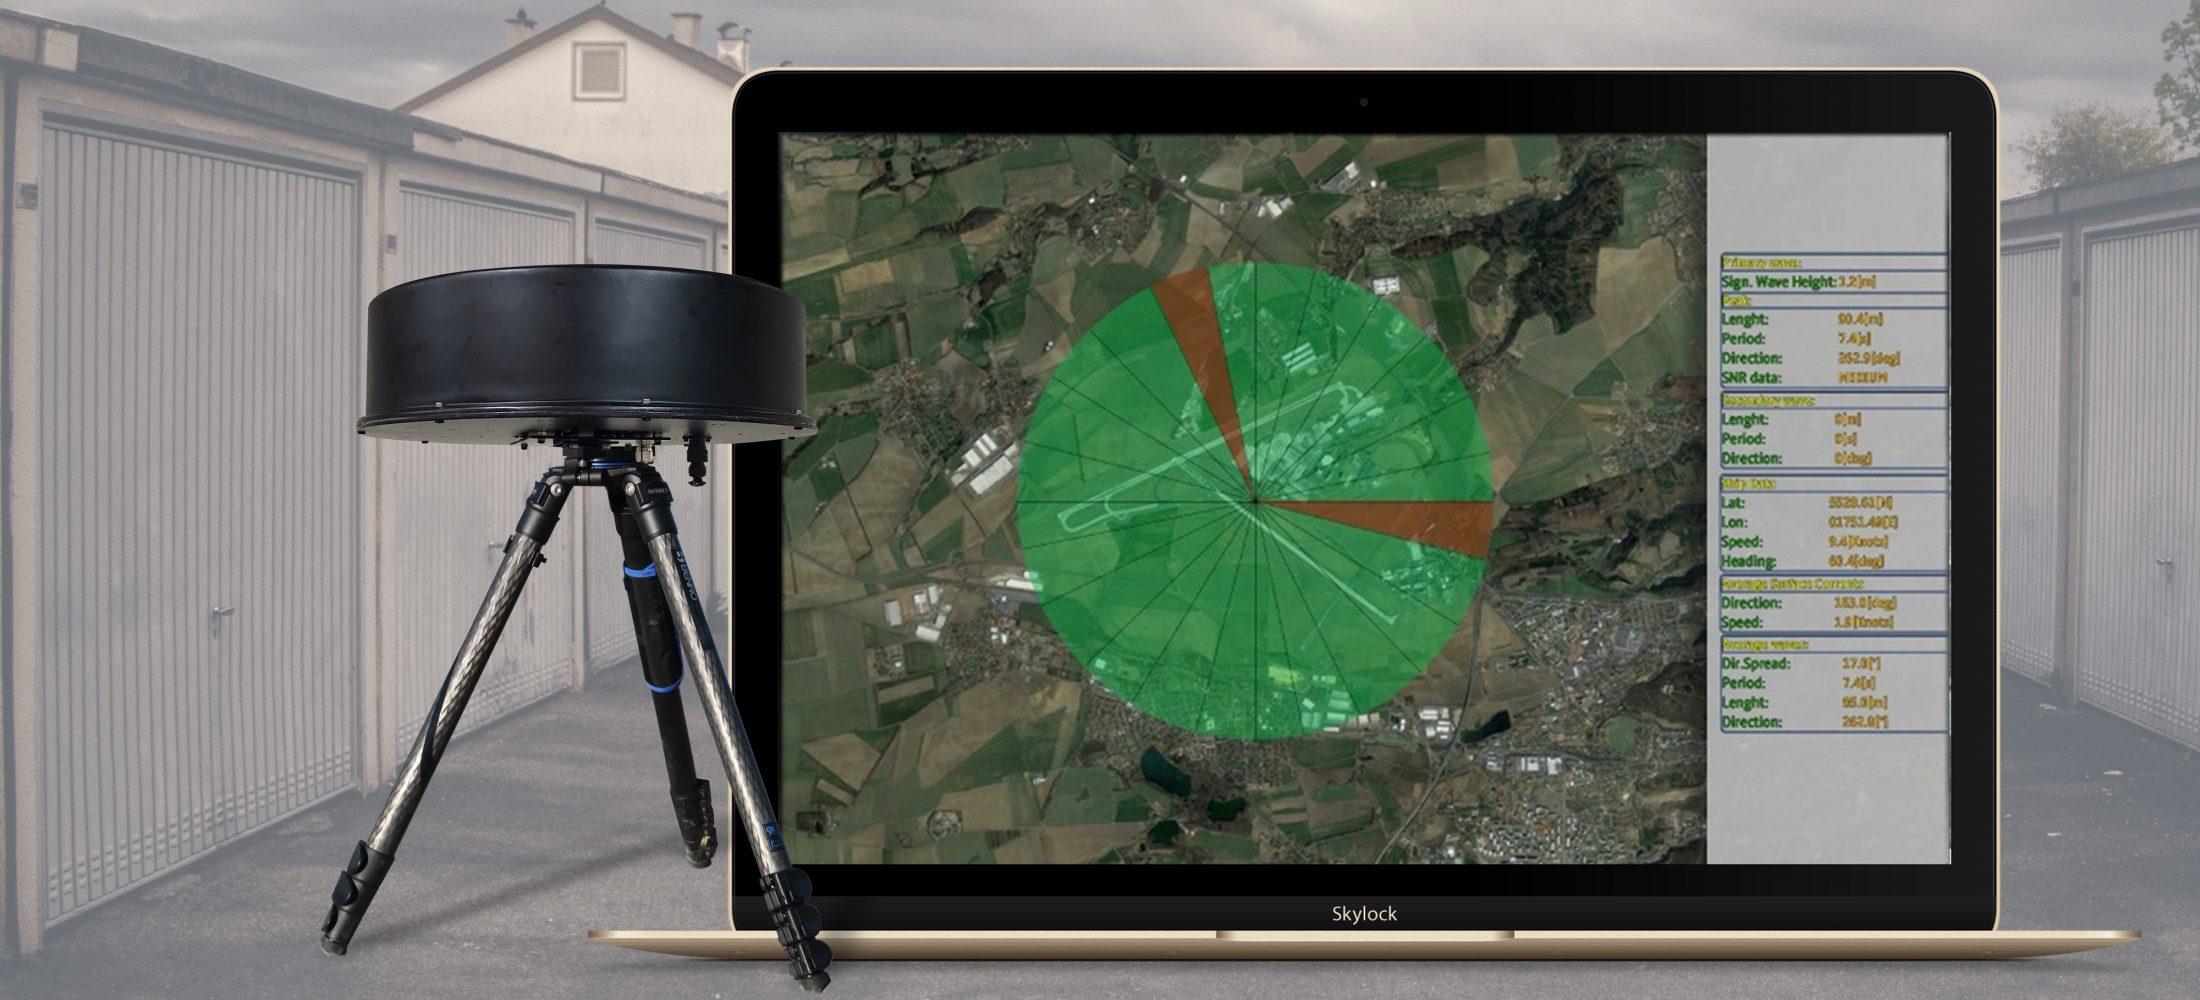 Counter Drone Interceptor